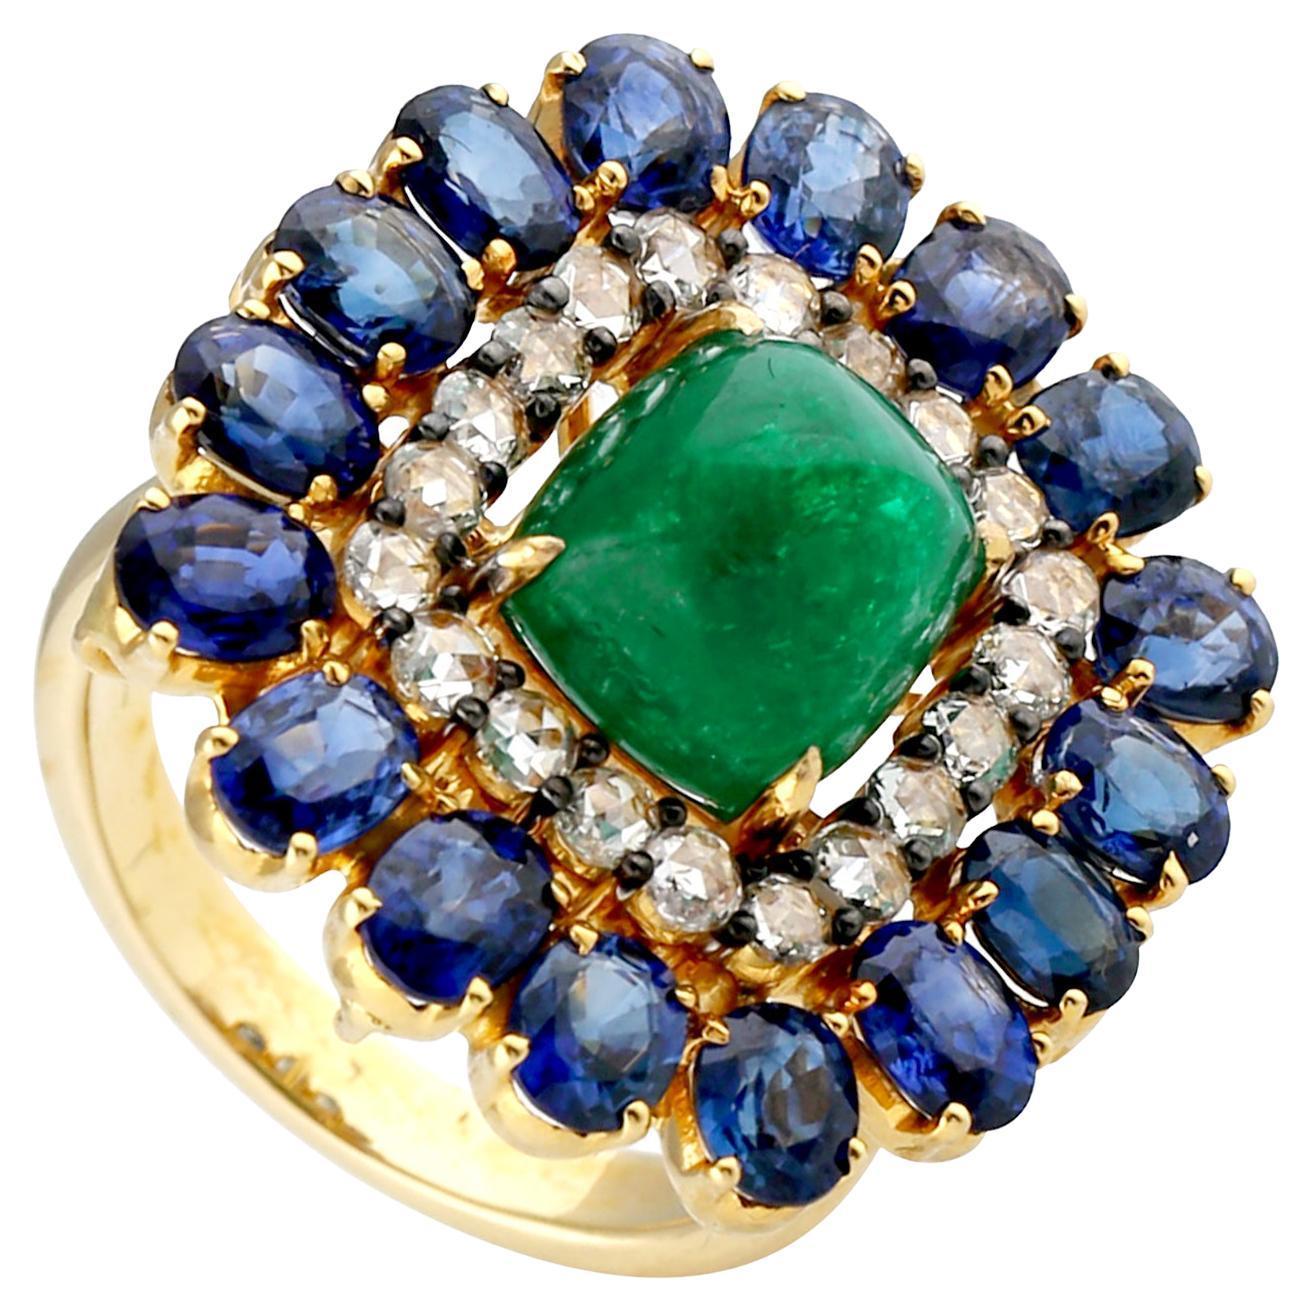 Designer Emerald Sapphire and Diamond Ring in 14k Yellow Gold